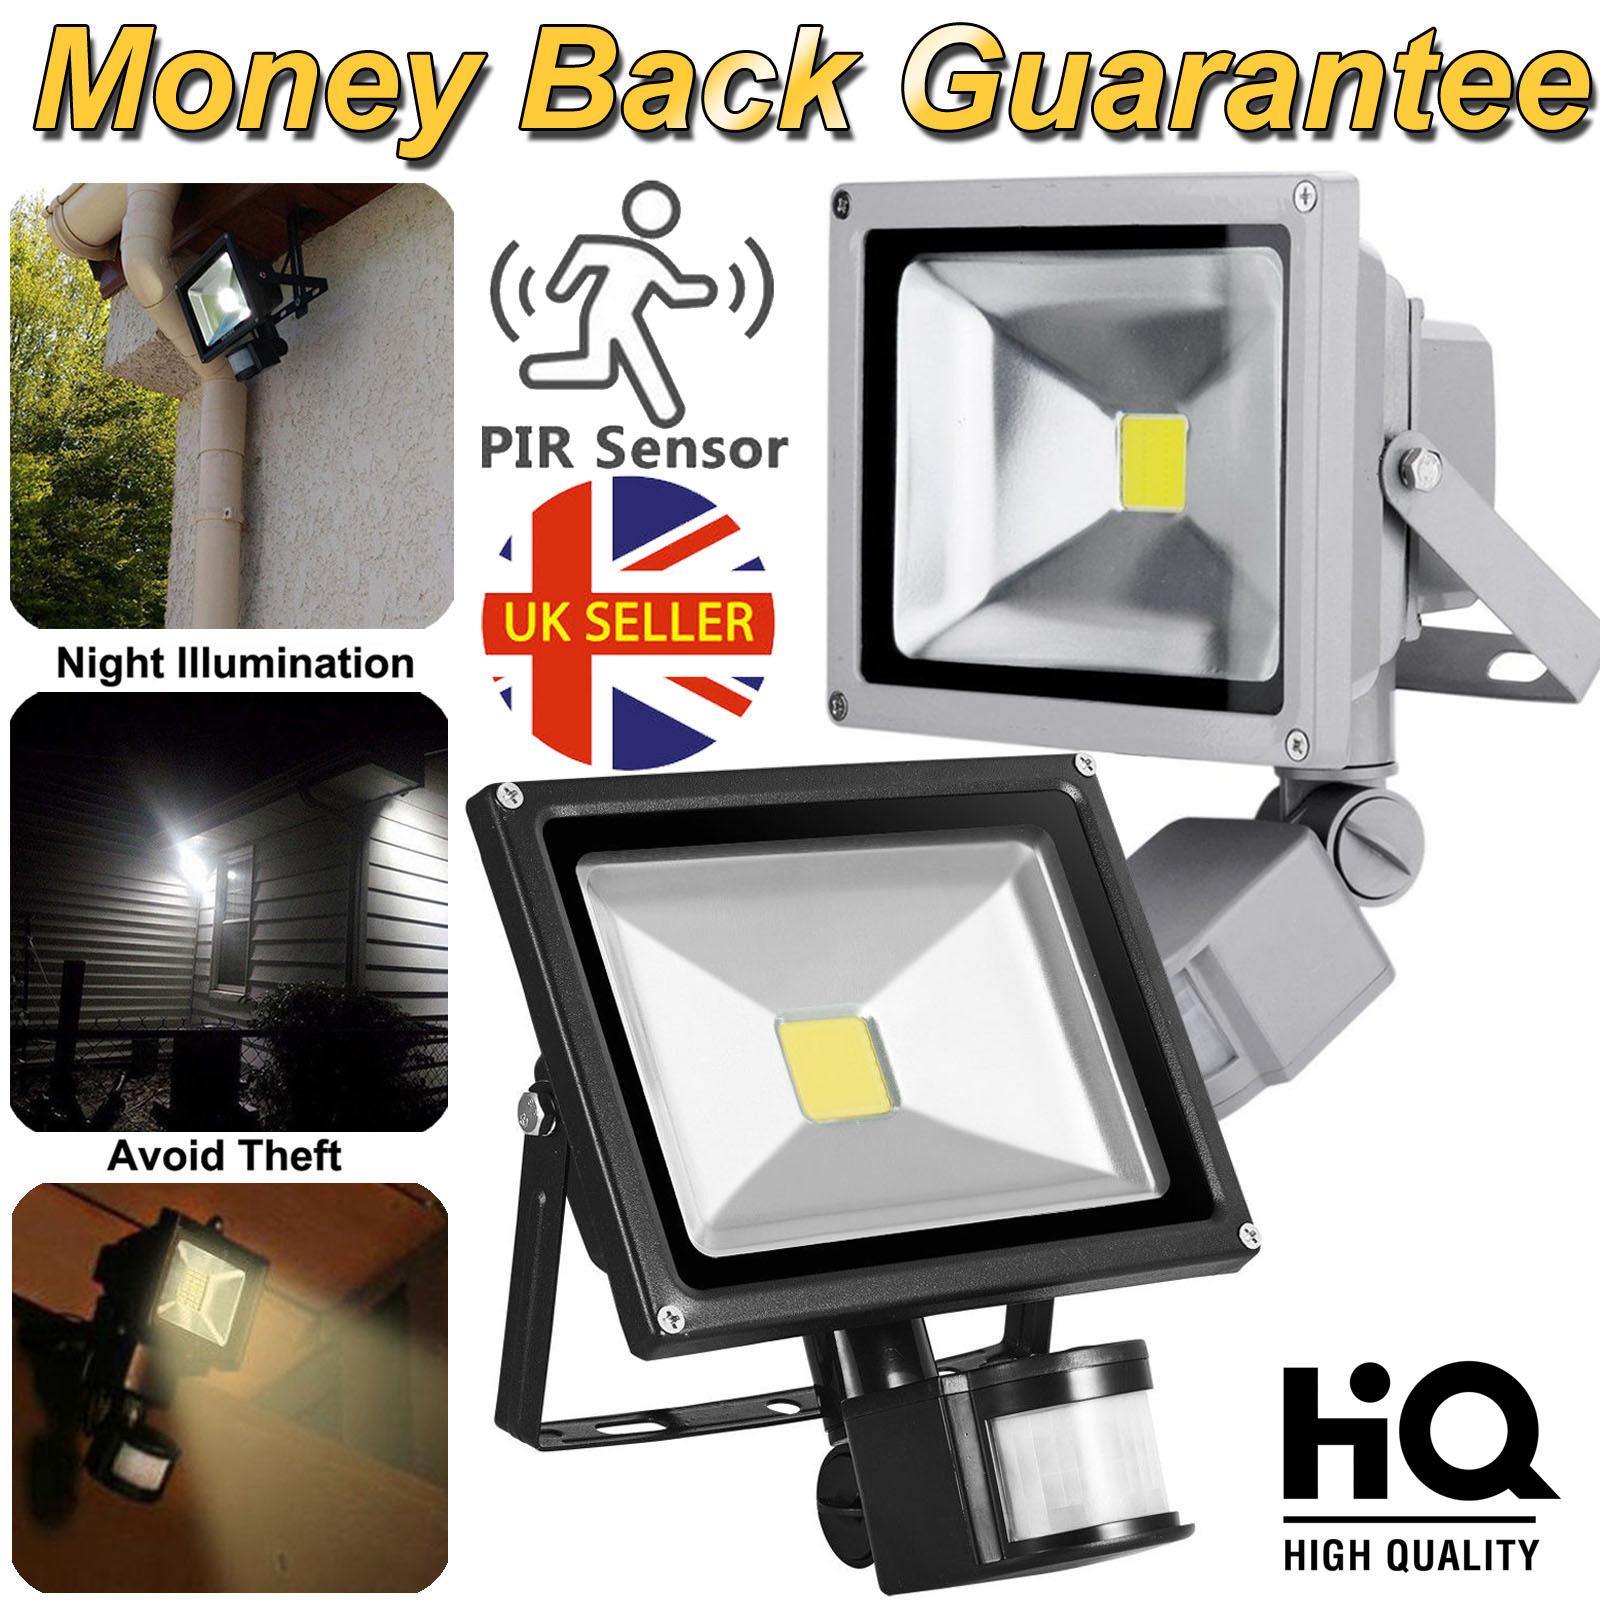 30W bright LED timer PIR Sensor Low Energy Outdoor Flood Security wall Light